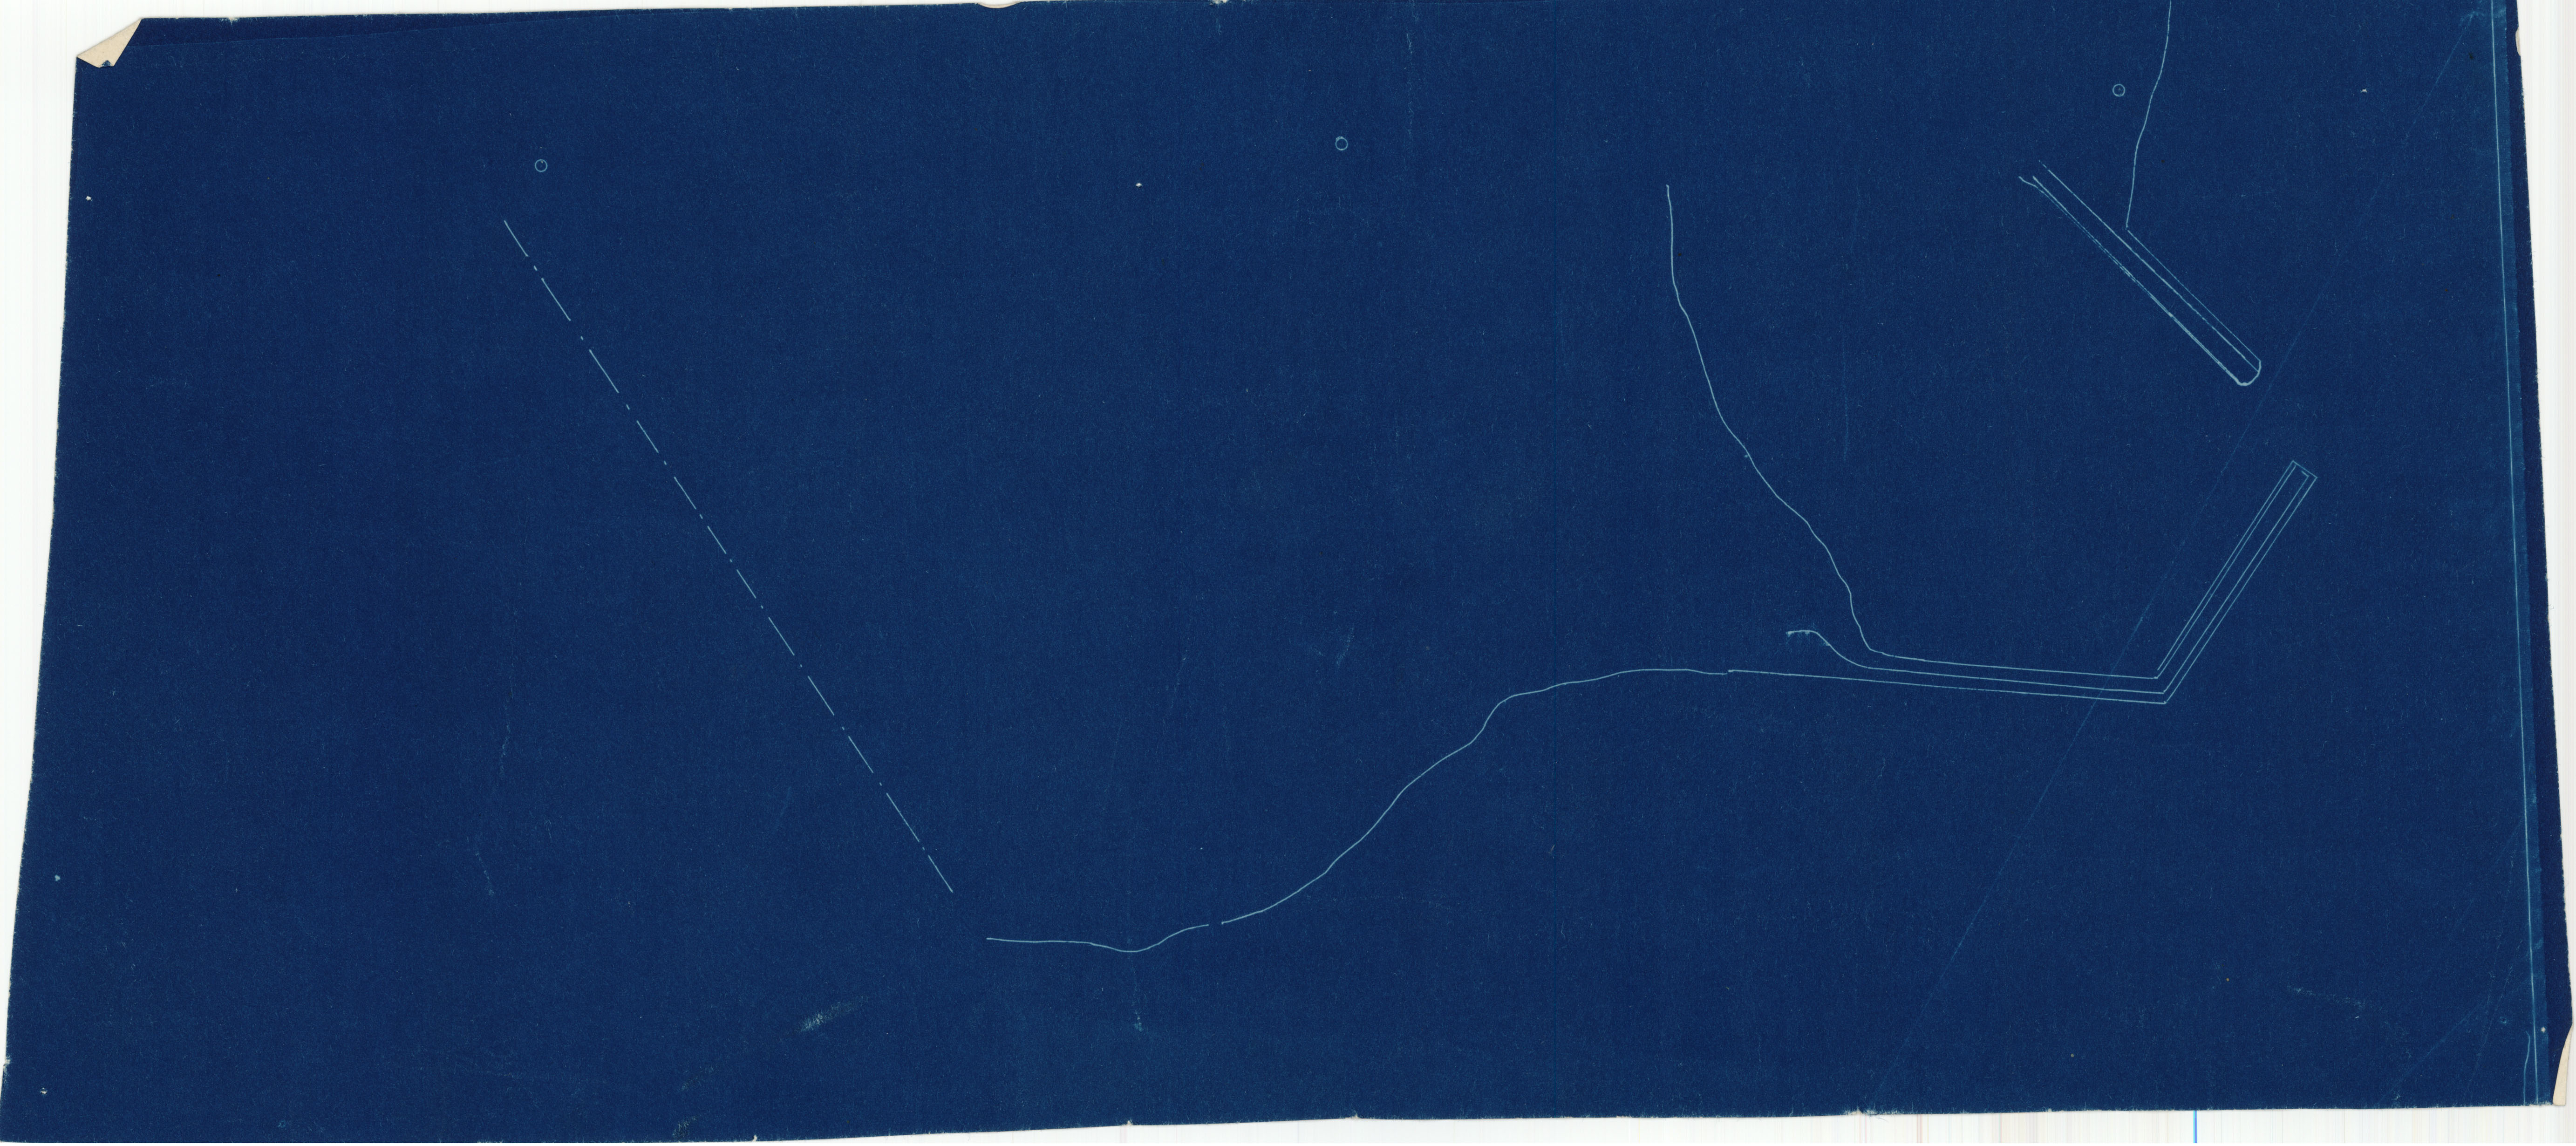 karl johan kart File:Jarlsberg og Larviks amt nr 67 vedheng  Kart over Karl  karl johan kart